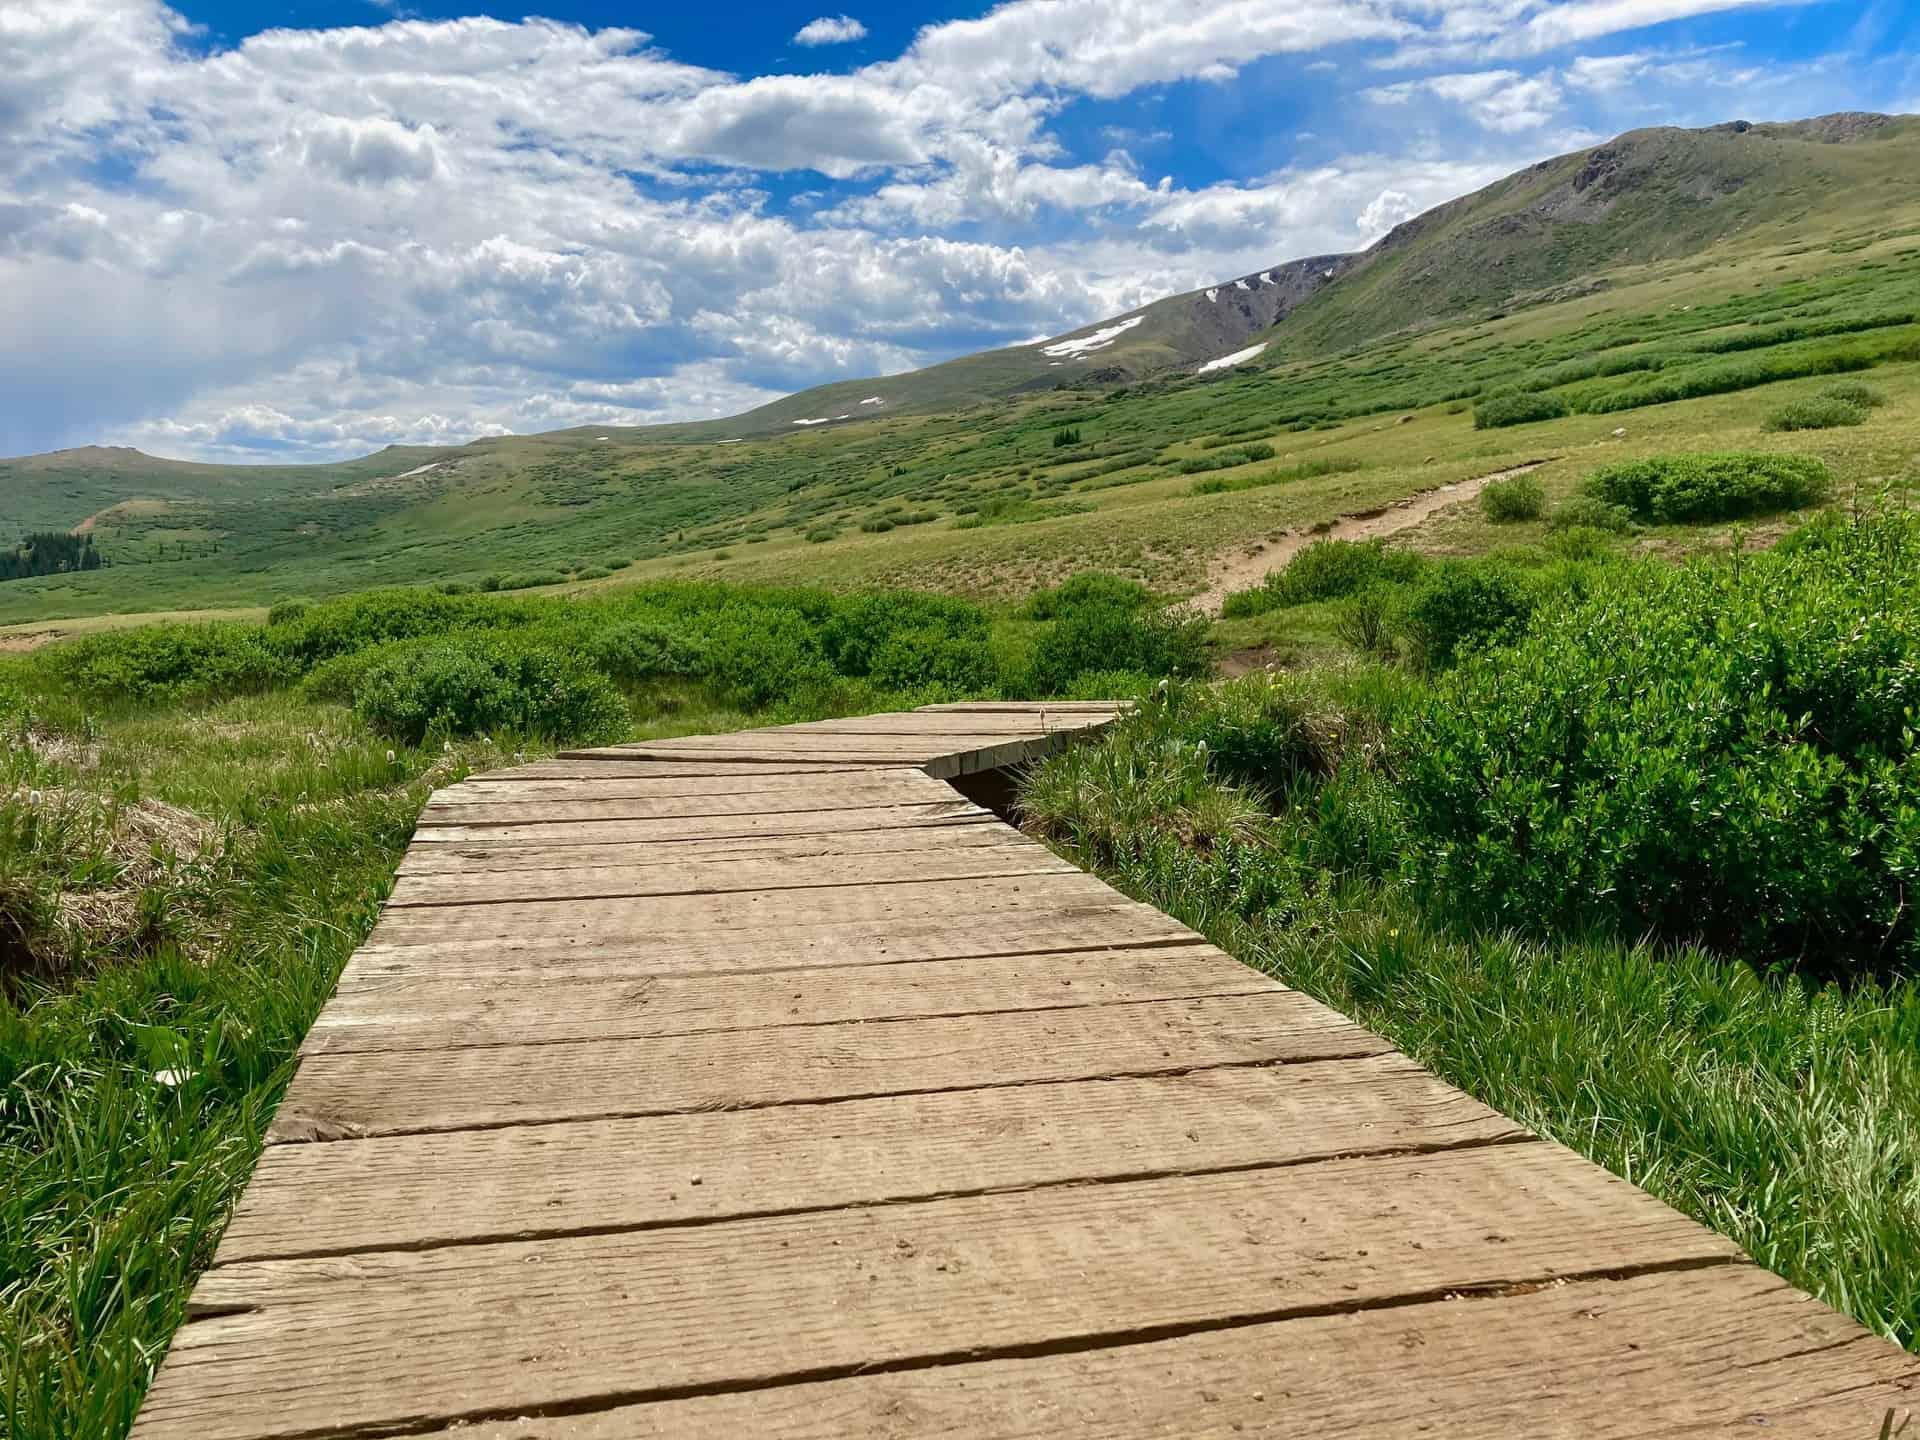 Square Top Lakes trail boardwalk on Guanella Pass